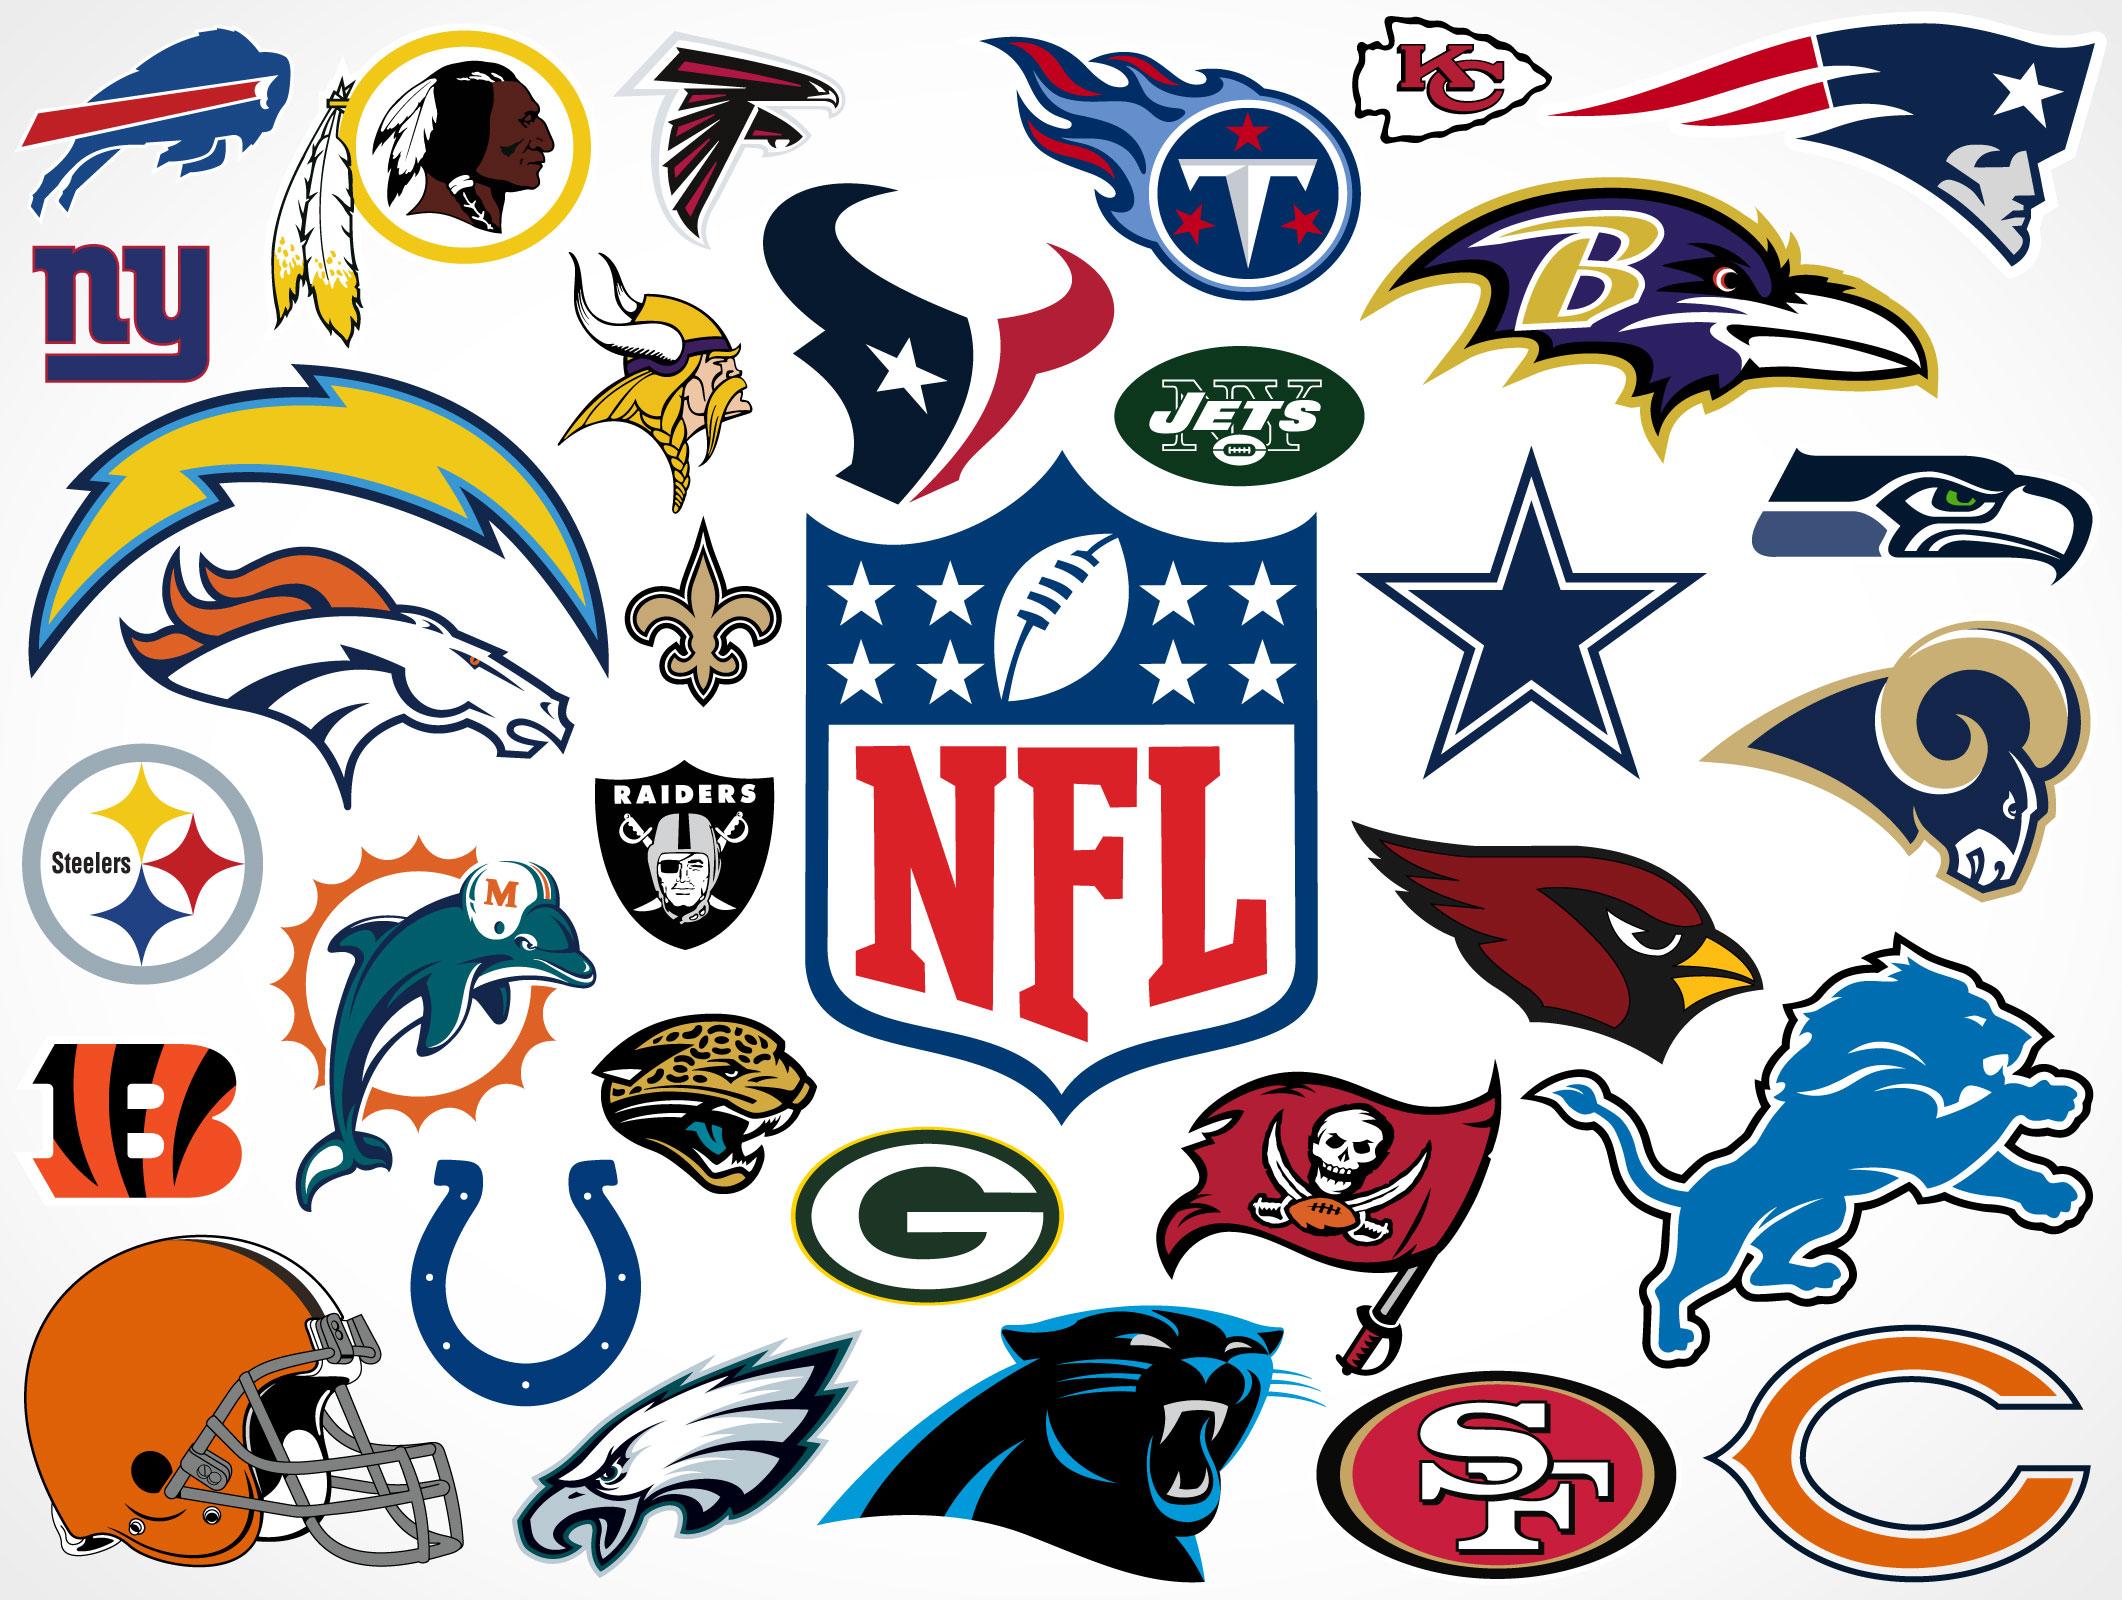 NFL Story